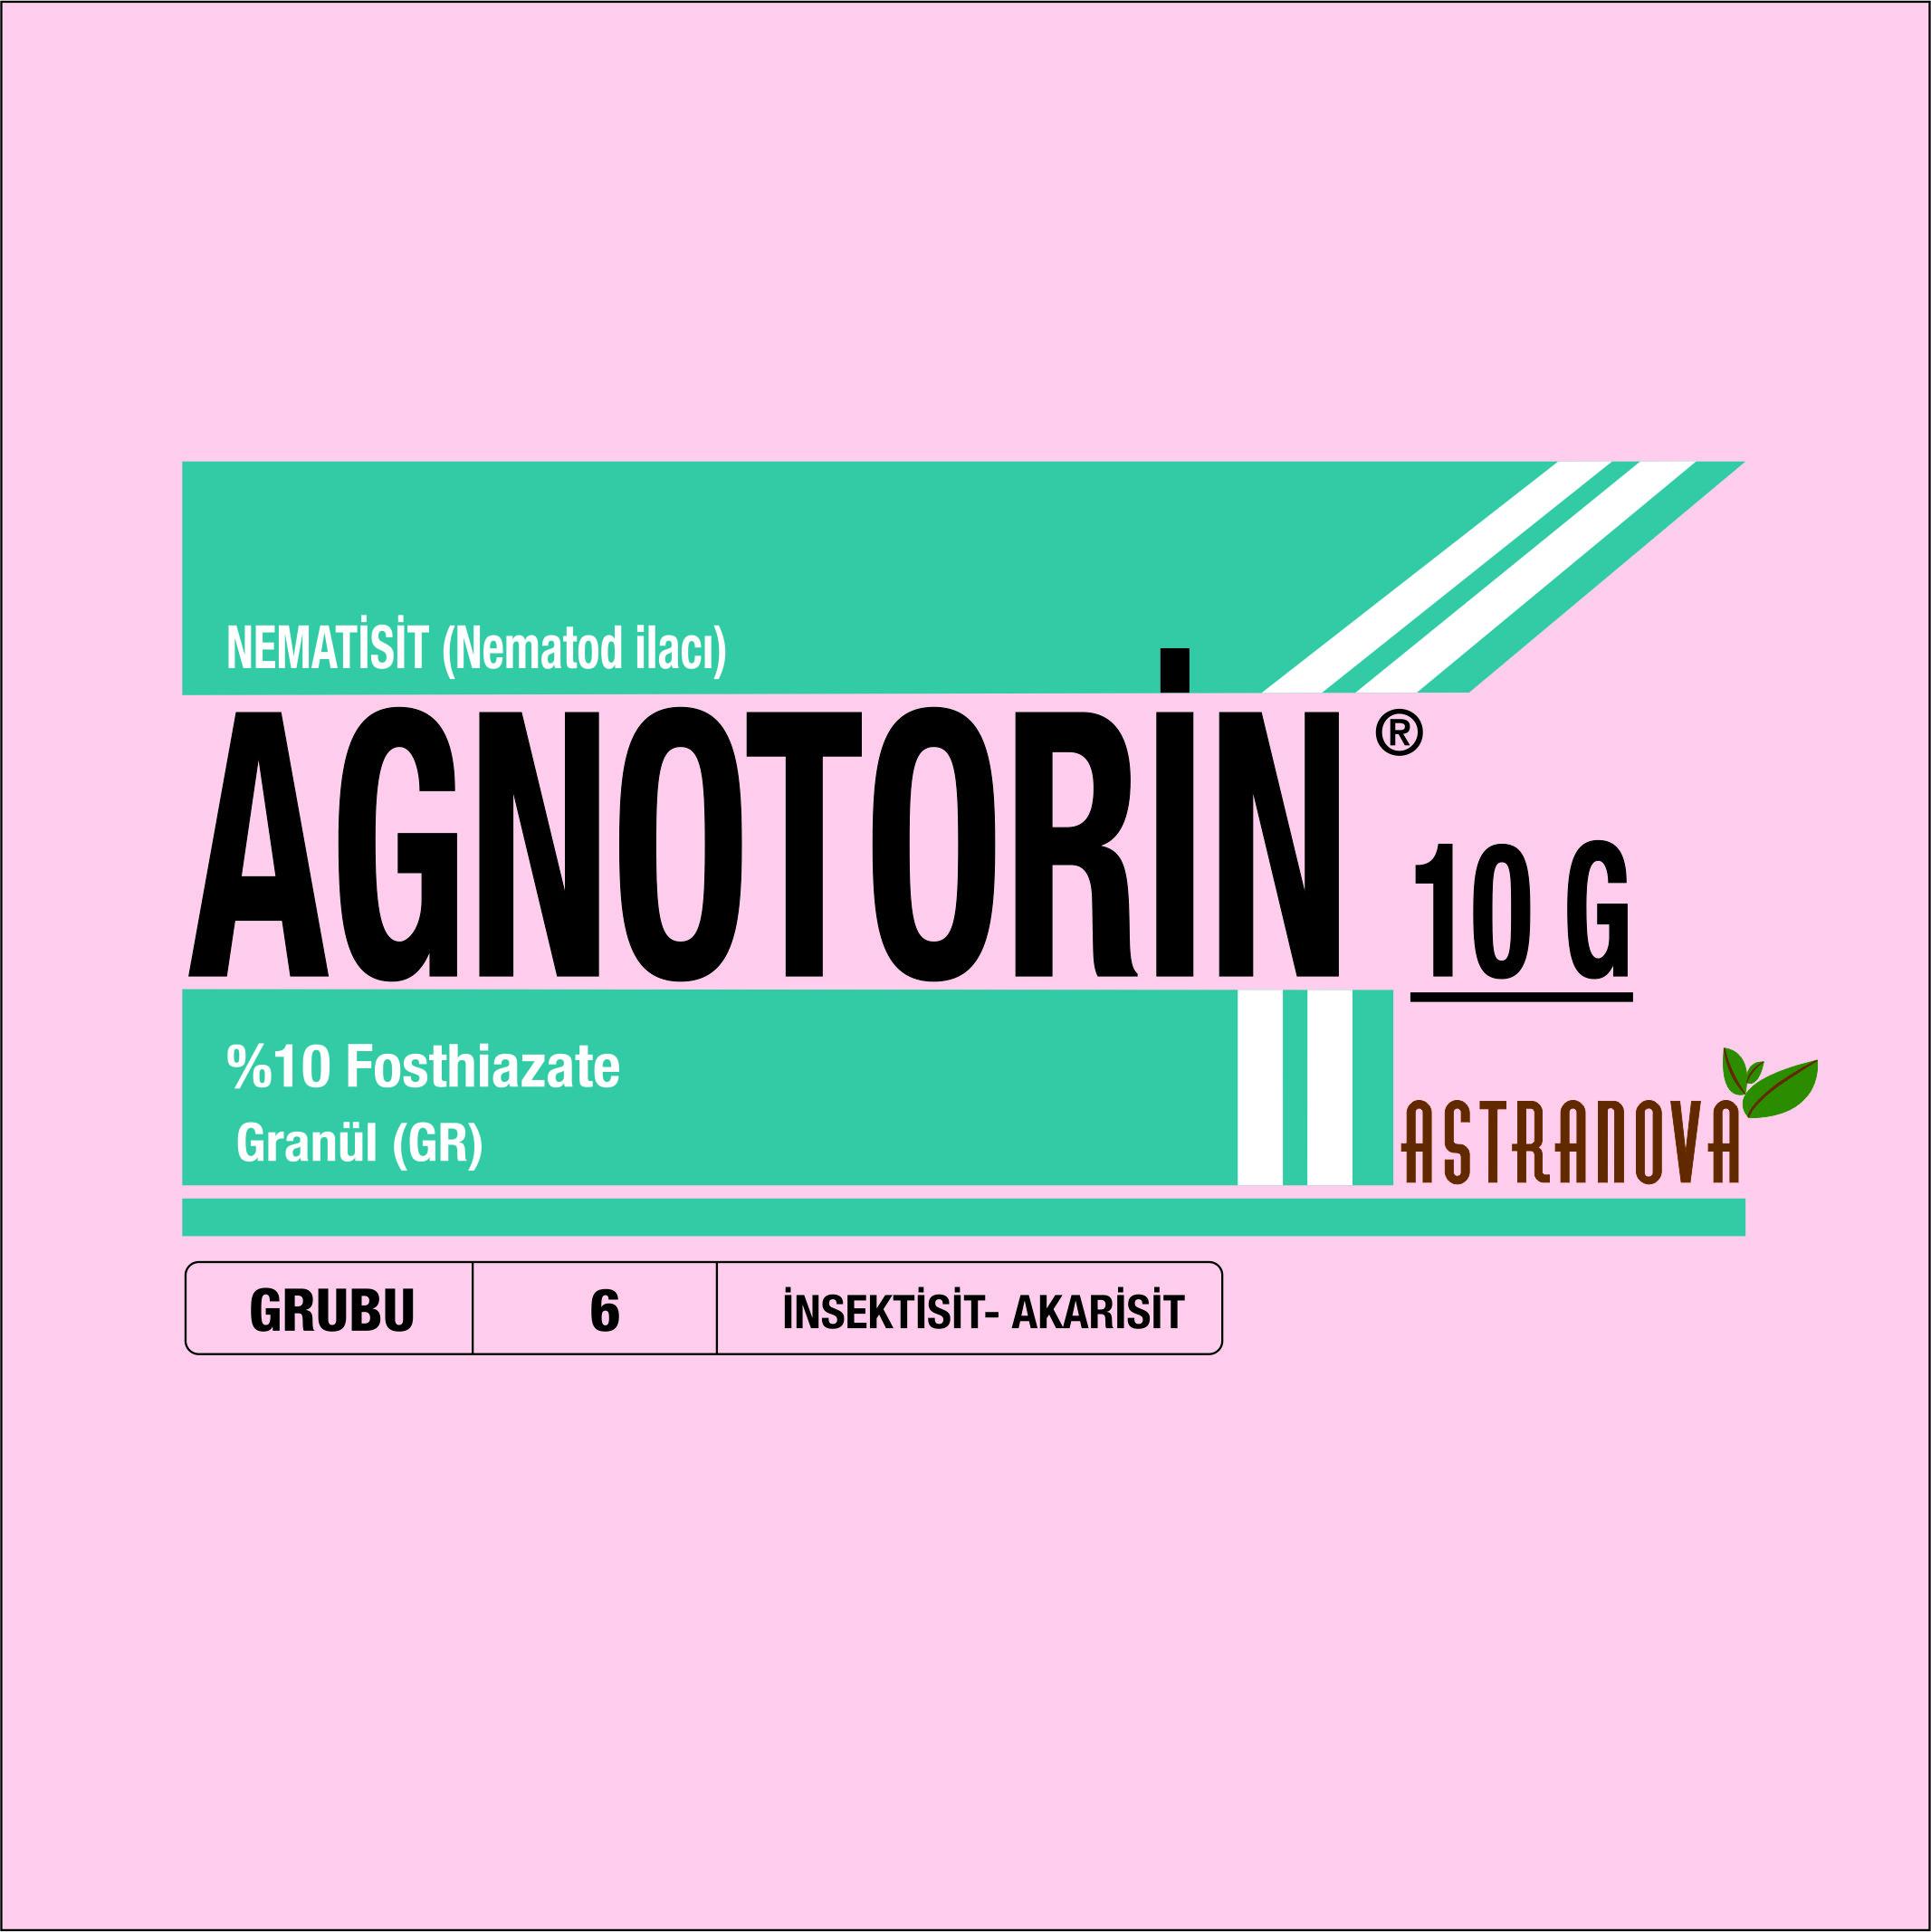 Agnotorin® 10 G